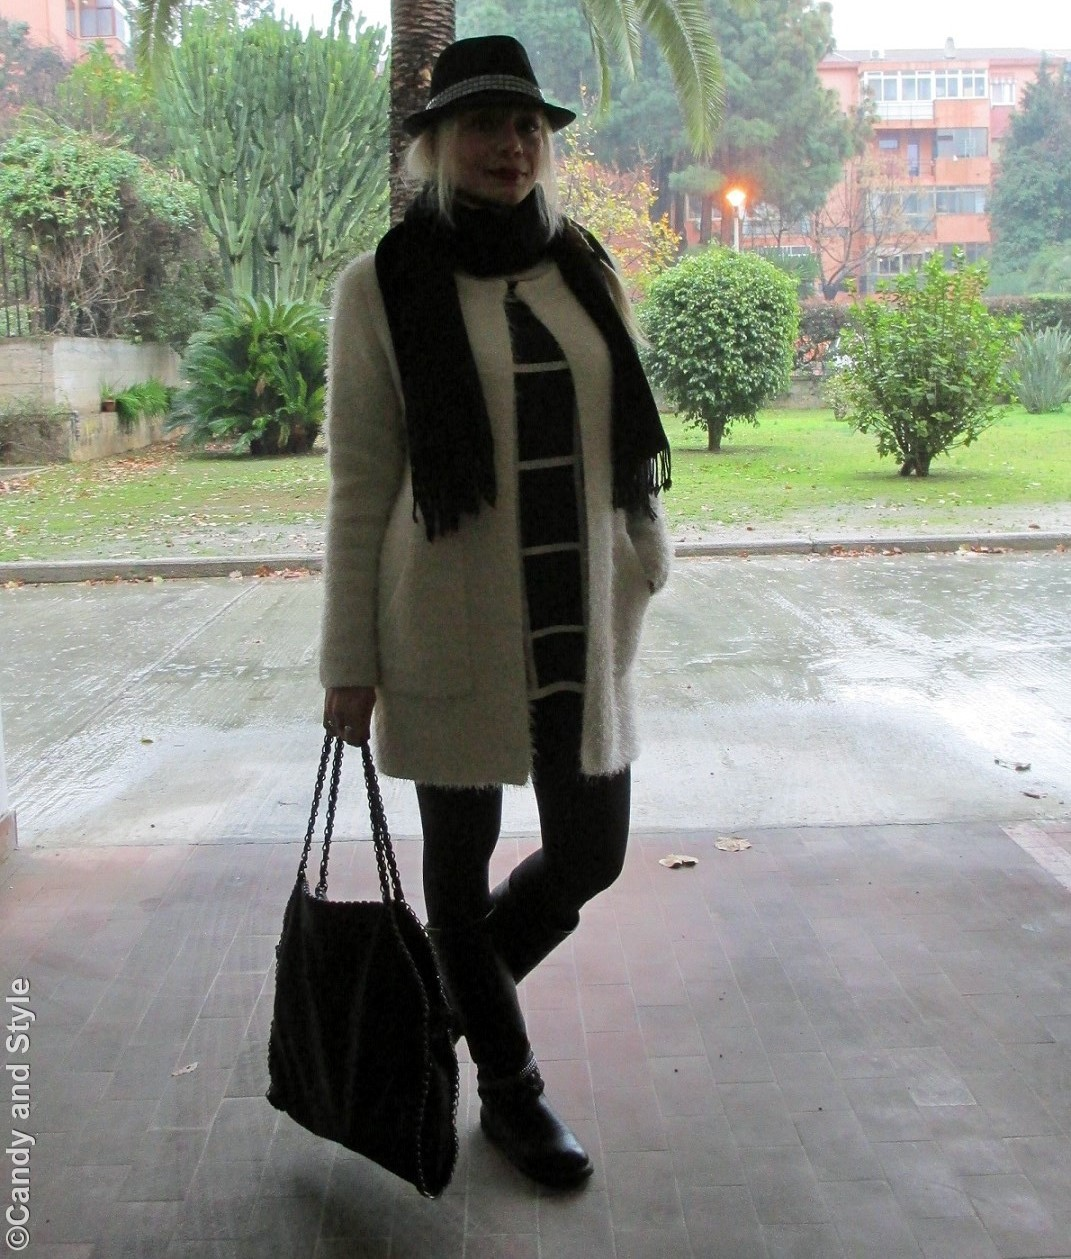 FuzzyJacket+OversizedScarf+PlaidSweater+Leggings+Bikers+TrilbyHats+ChainBag+Braid - Lilli Candy and Style Fashion Blog